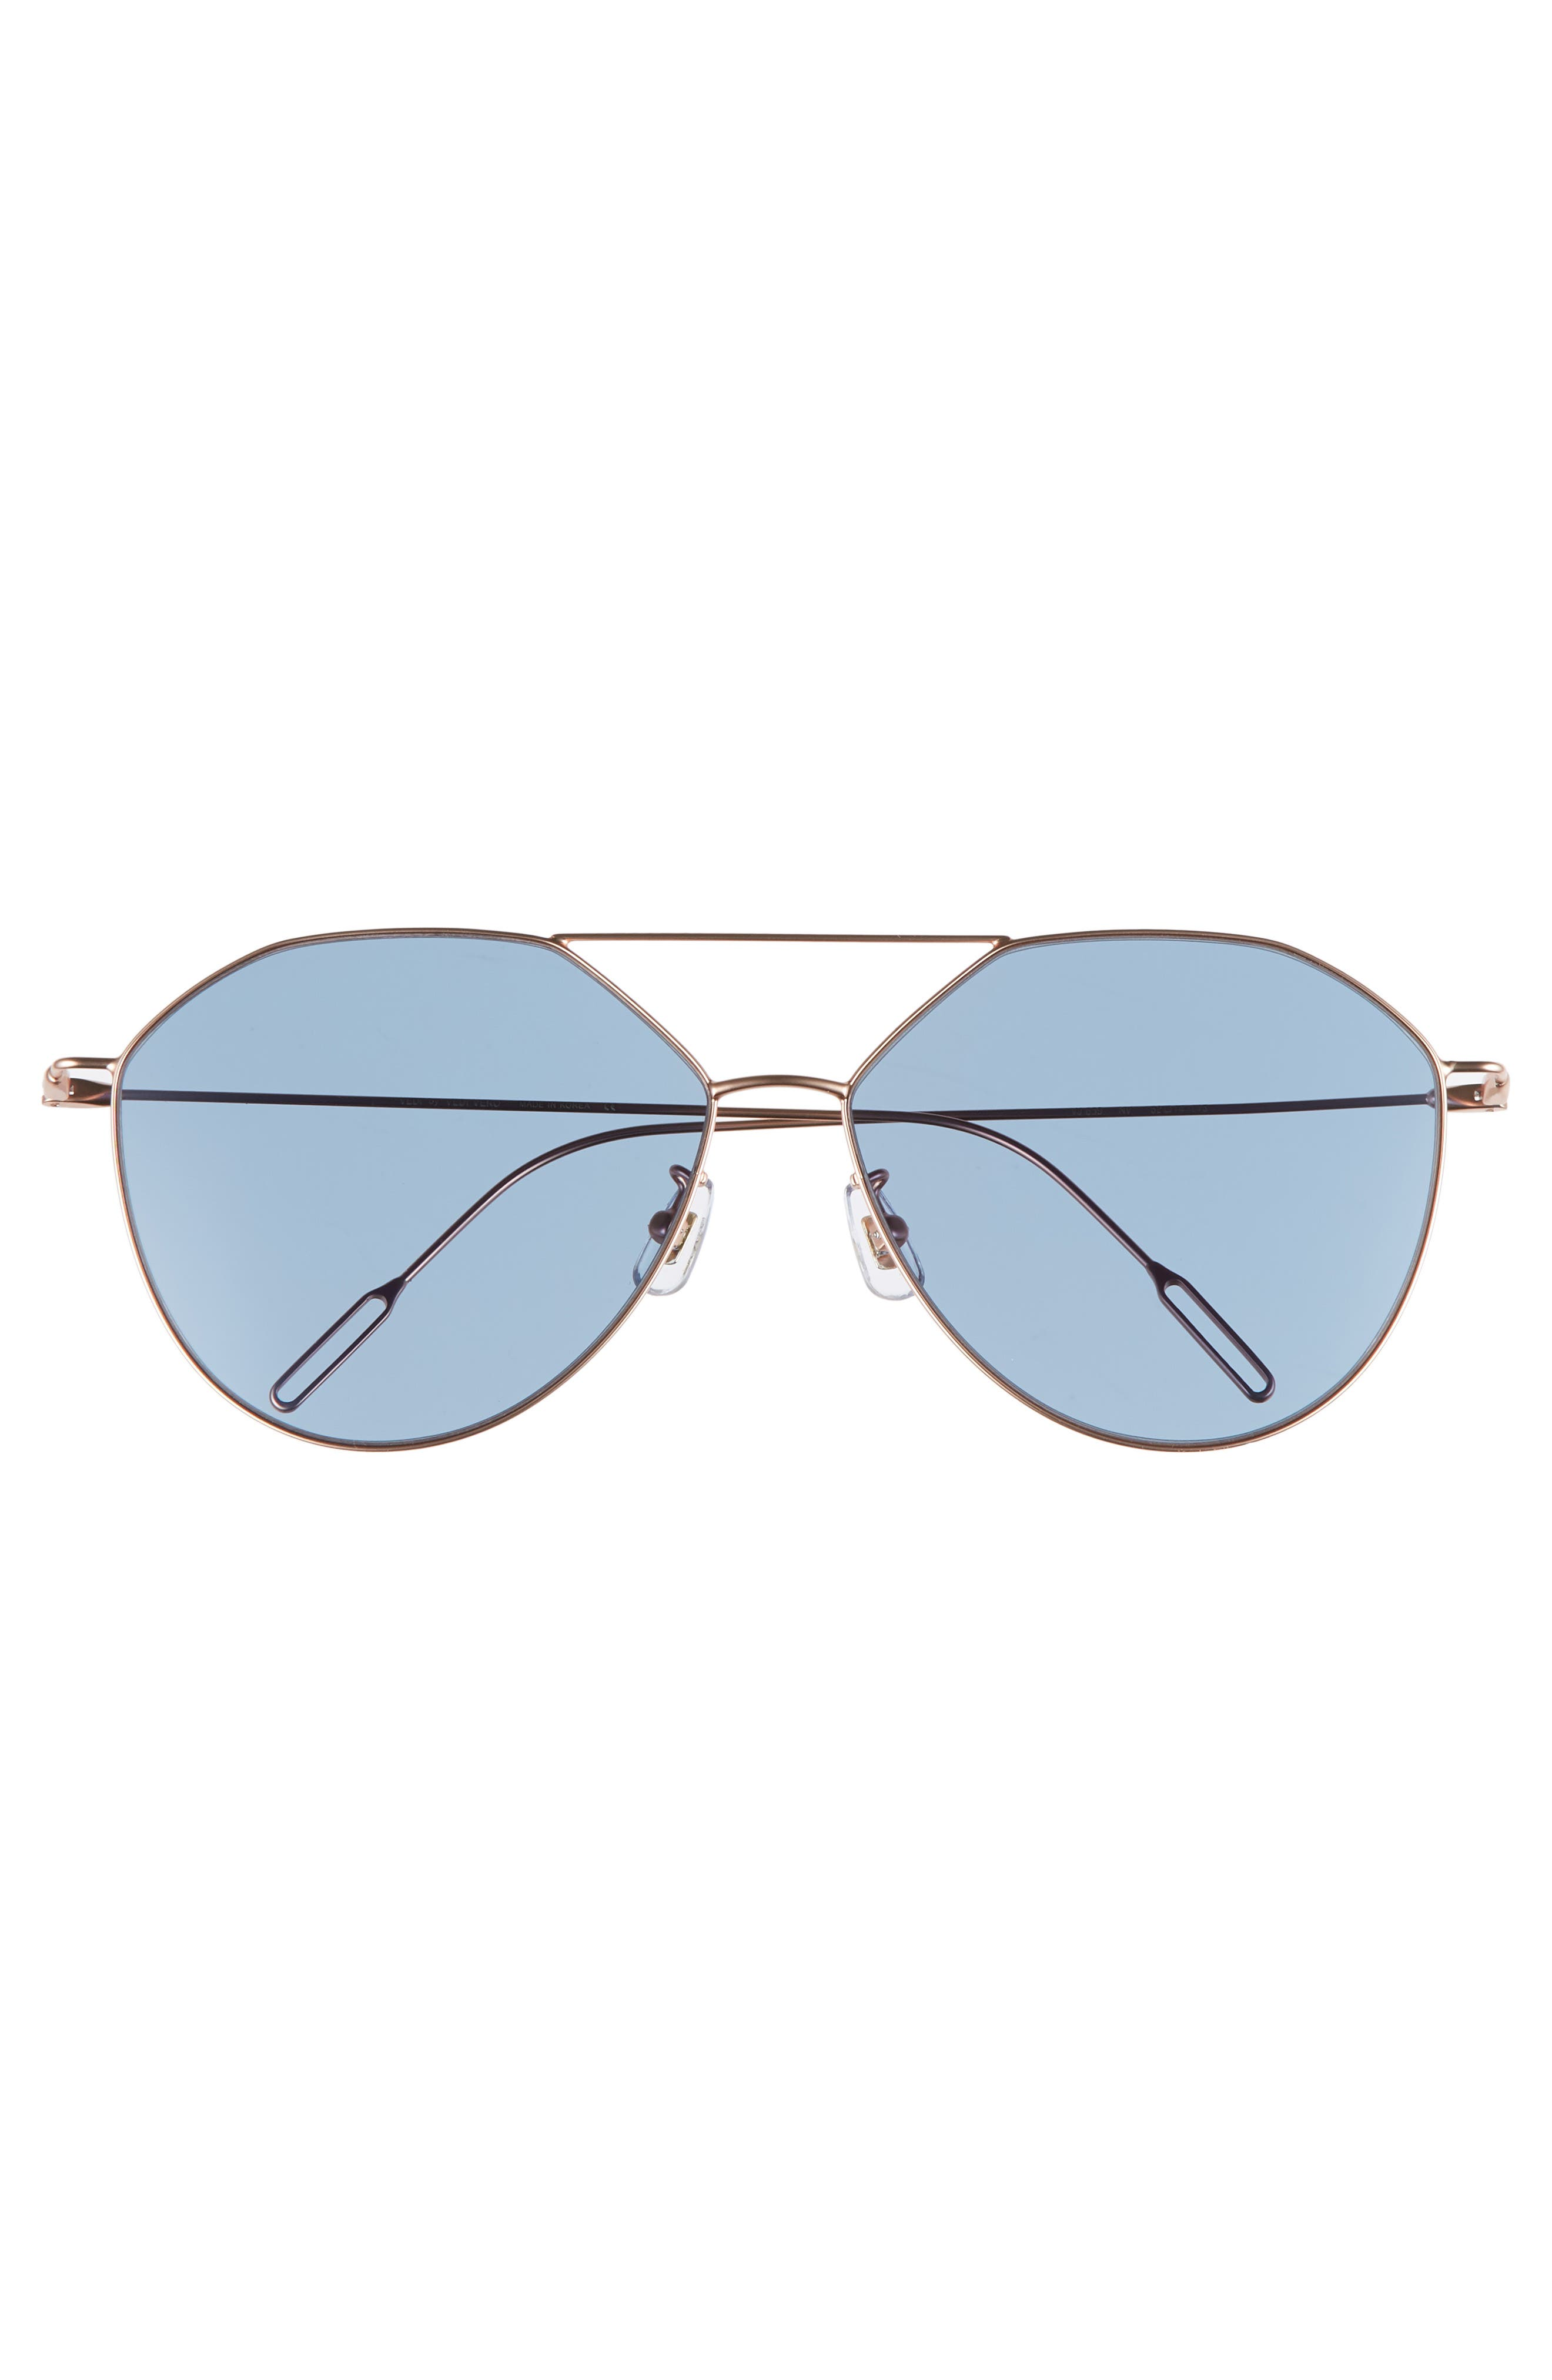 62mm Metal Oversize Aviator Sunglasses,                             Alternate thumbnail 3, color,                             ROSE GOLD/NAVY